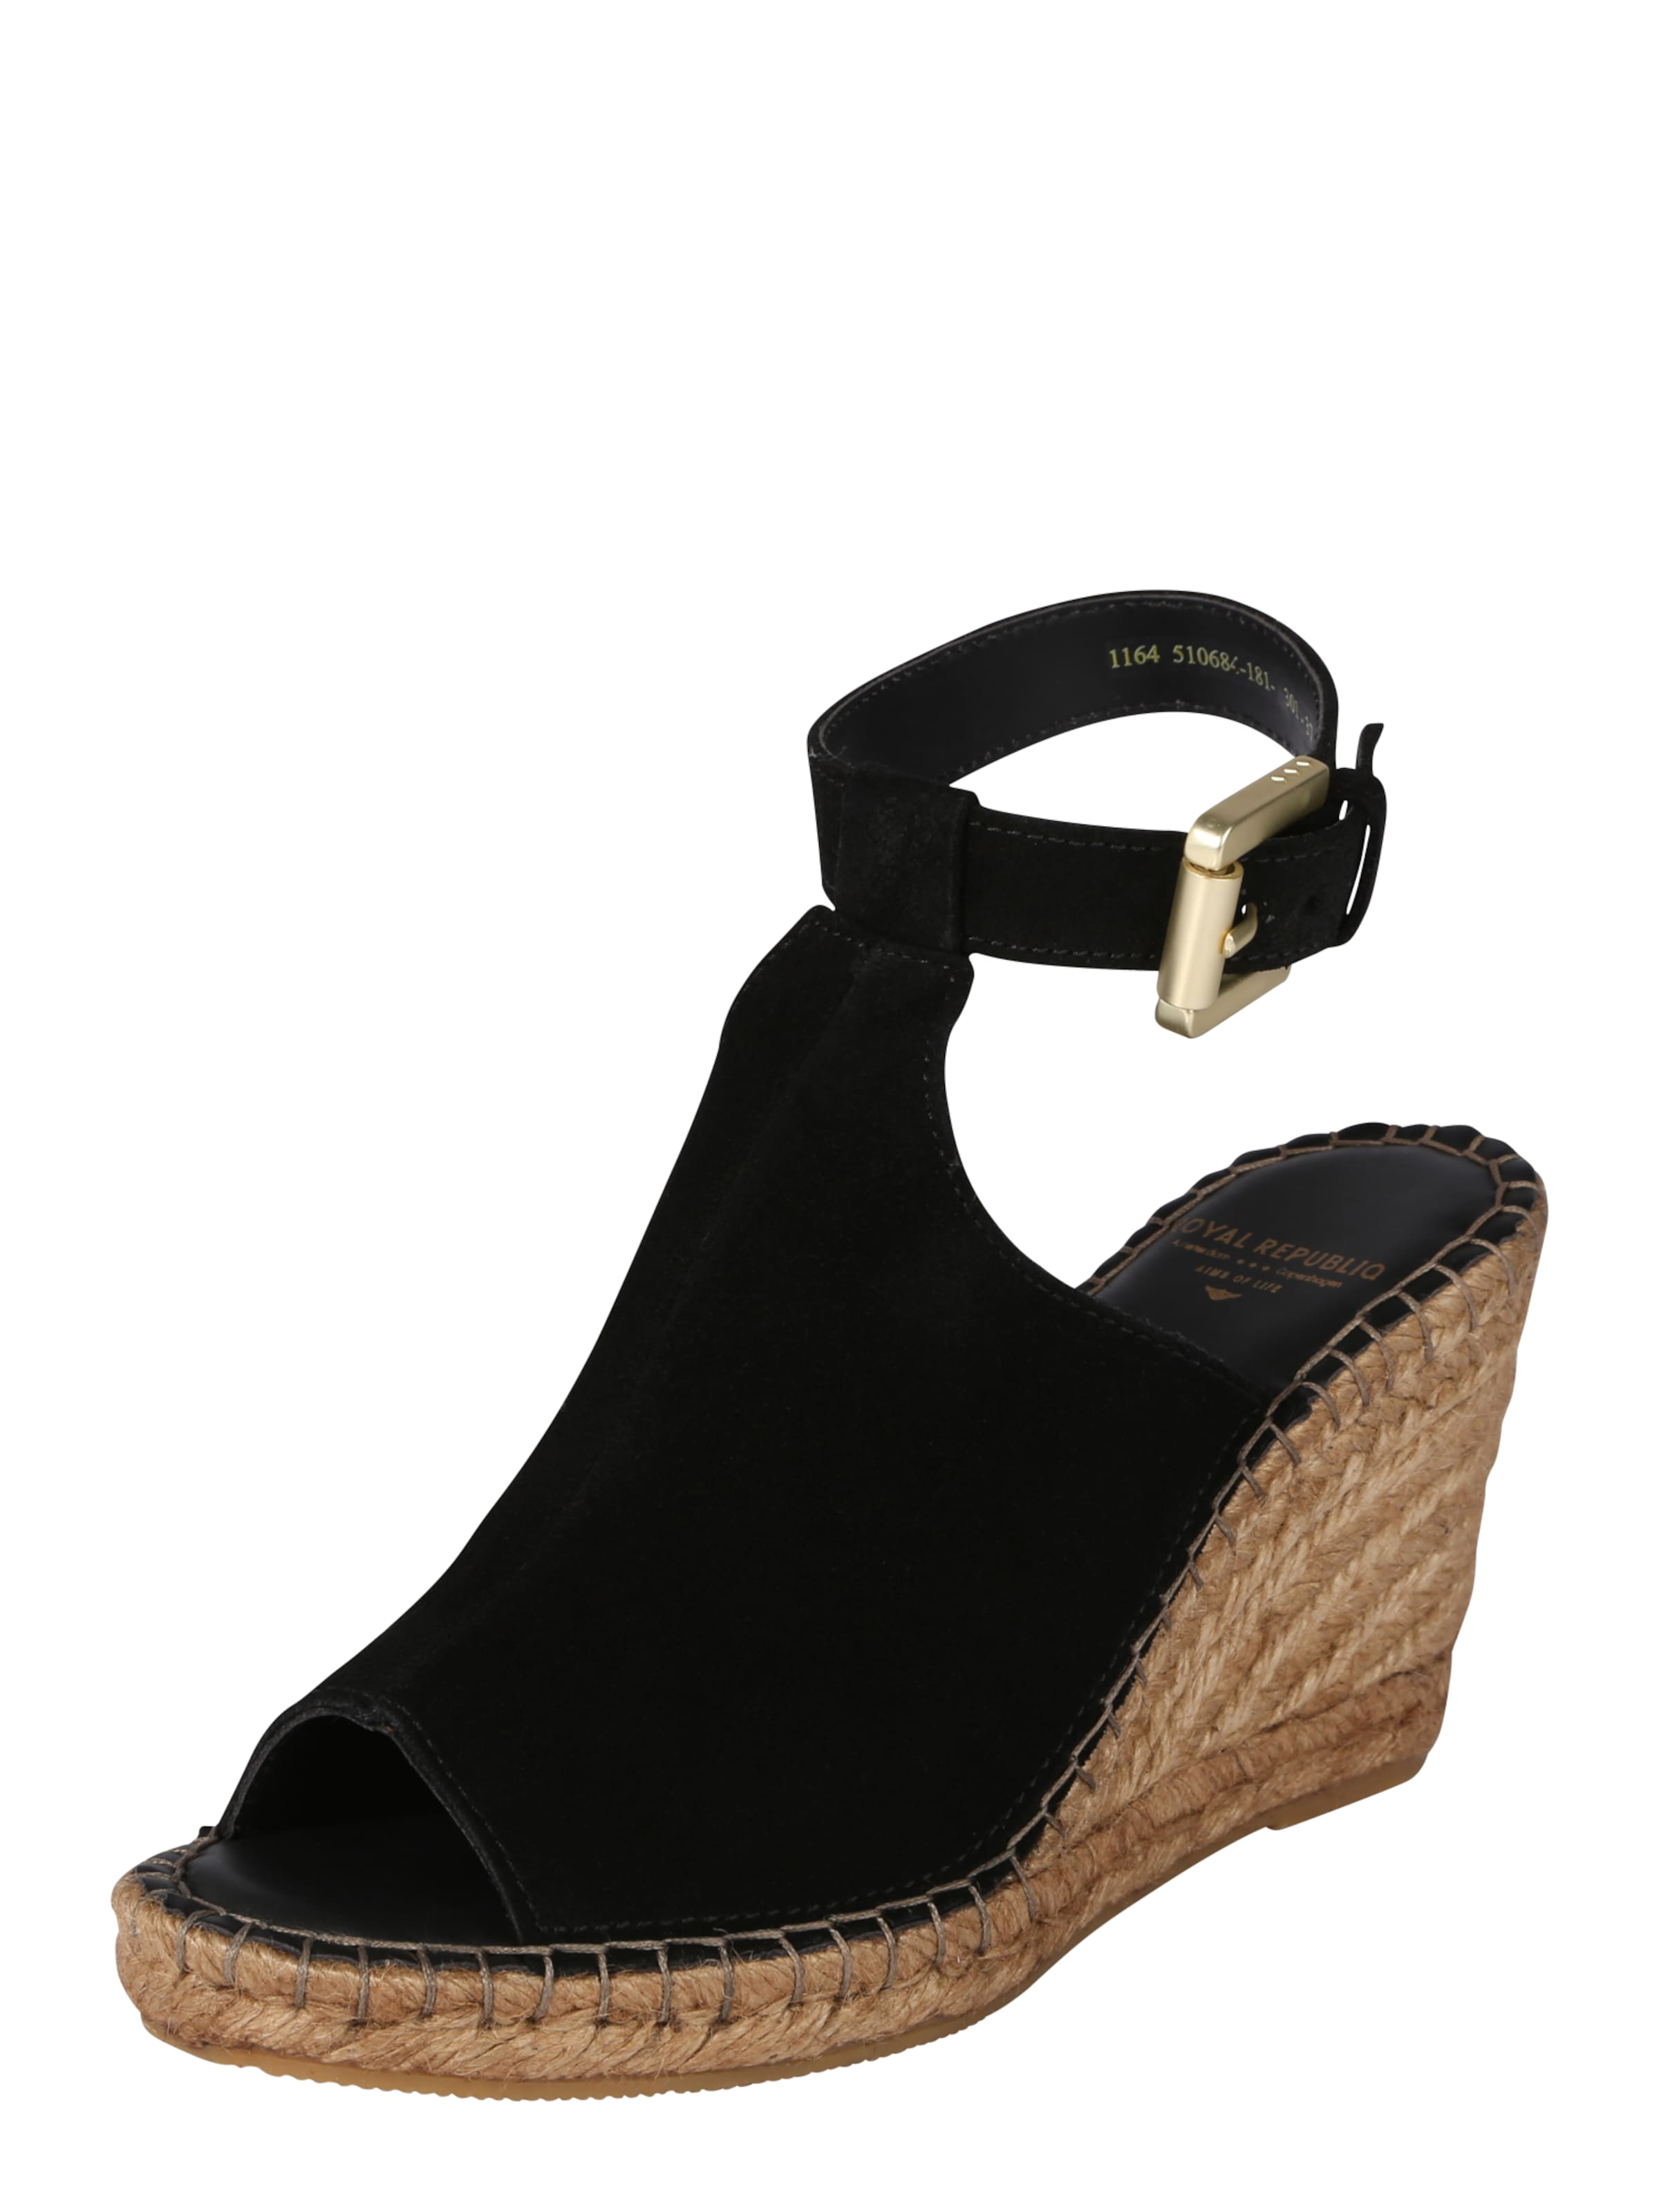 ROYAL REPUBLIQ Sandalen WAYFARER Verschleißfeste billige Schuhe